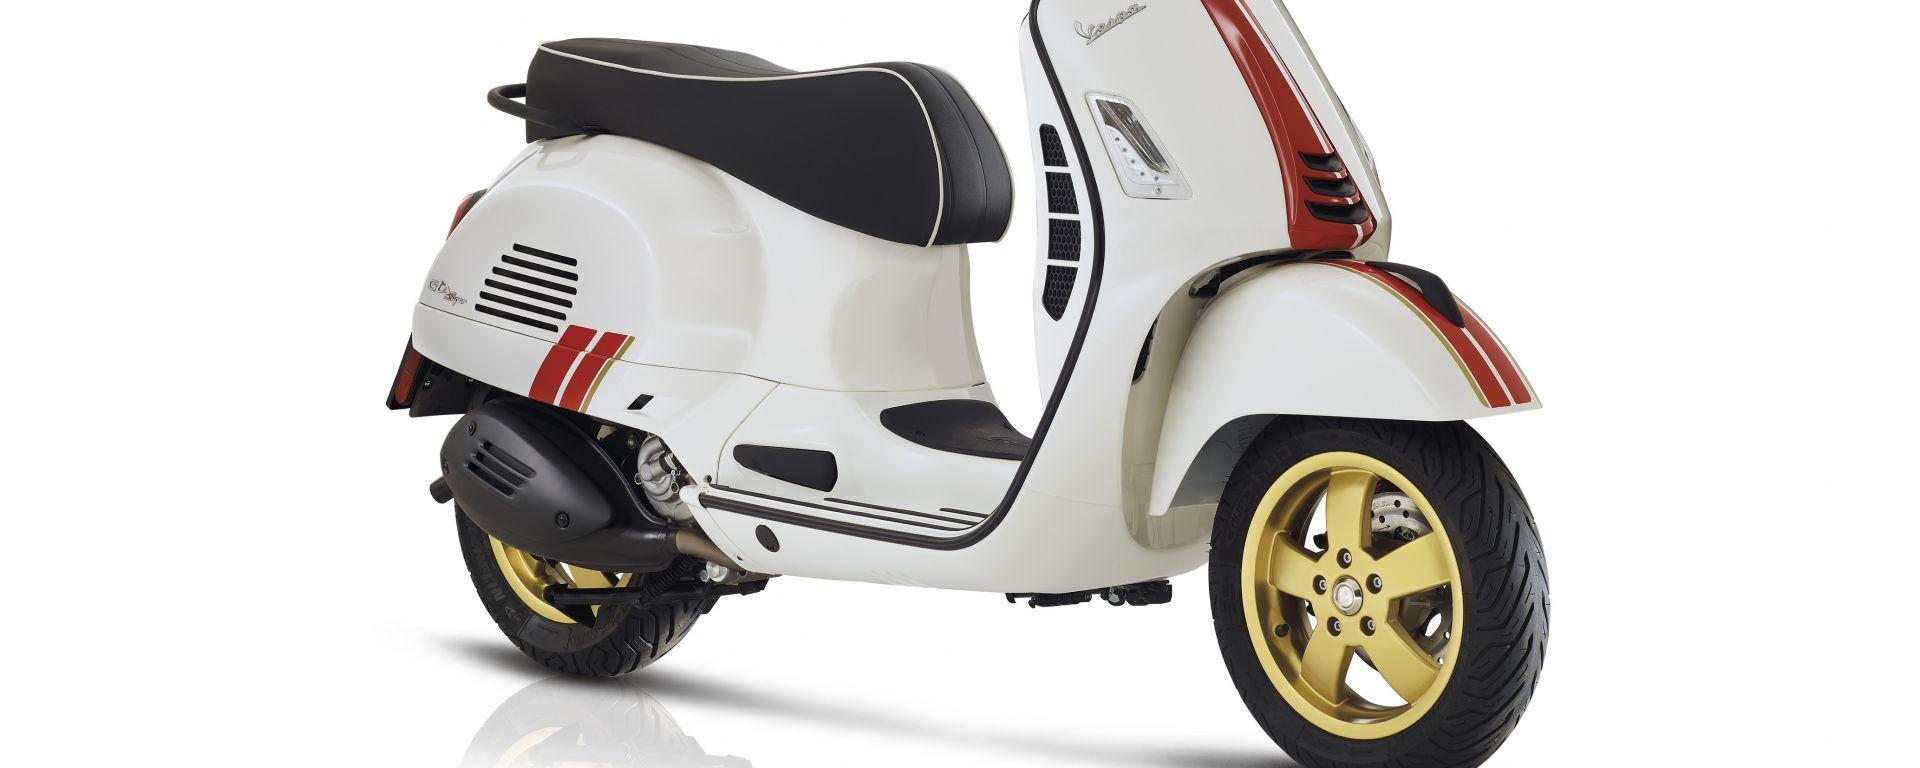 Vespa GTS Racing Sixties